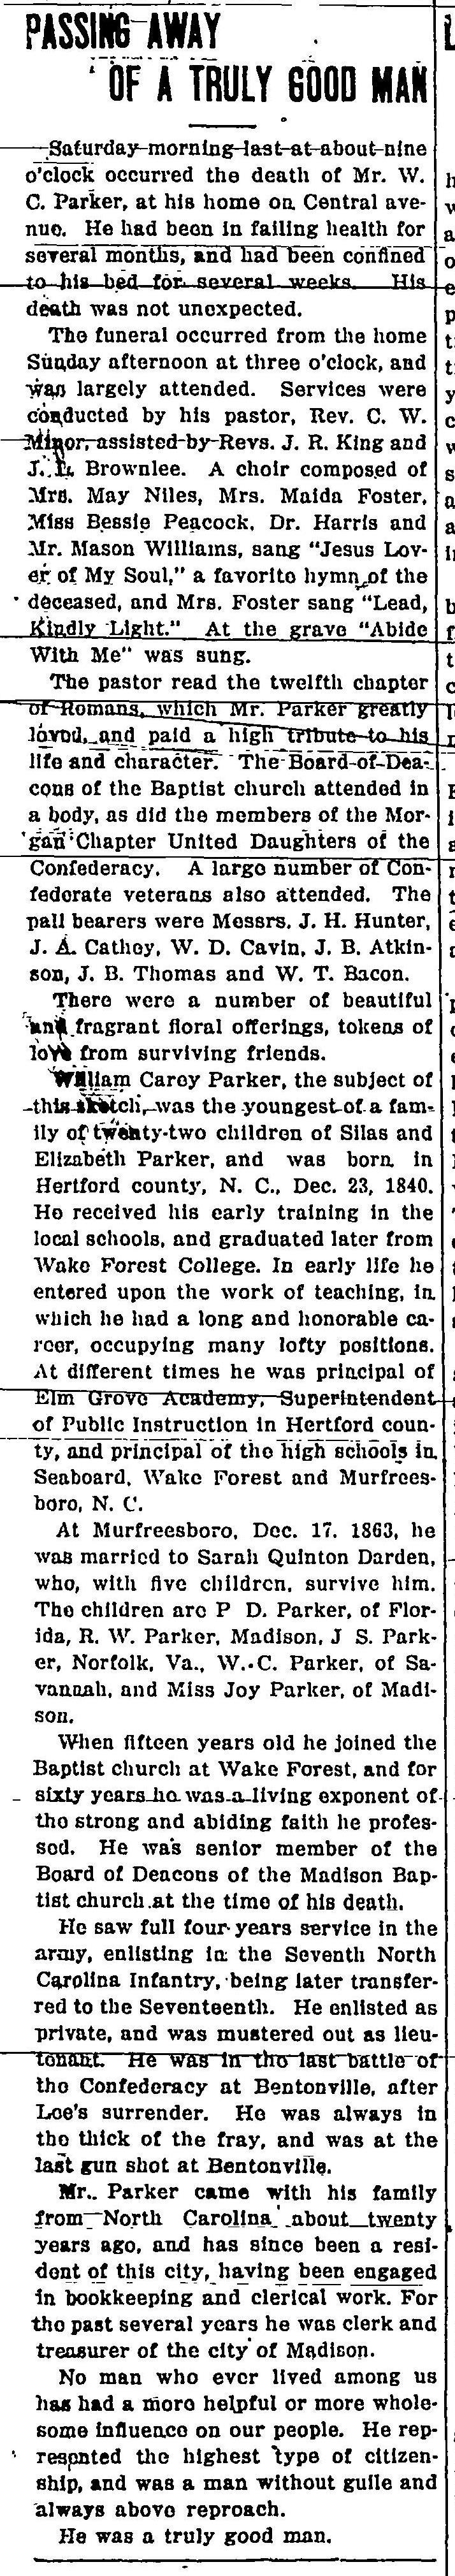 parker_williamcarey_1916-obituary.jpeg